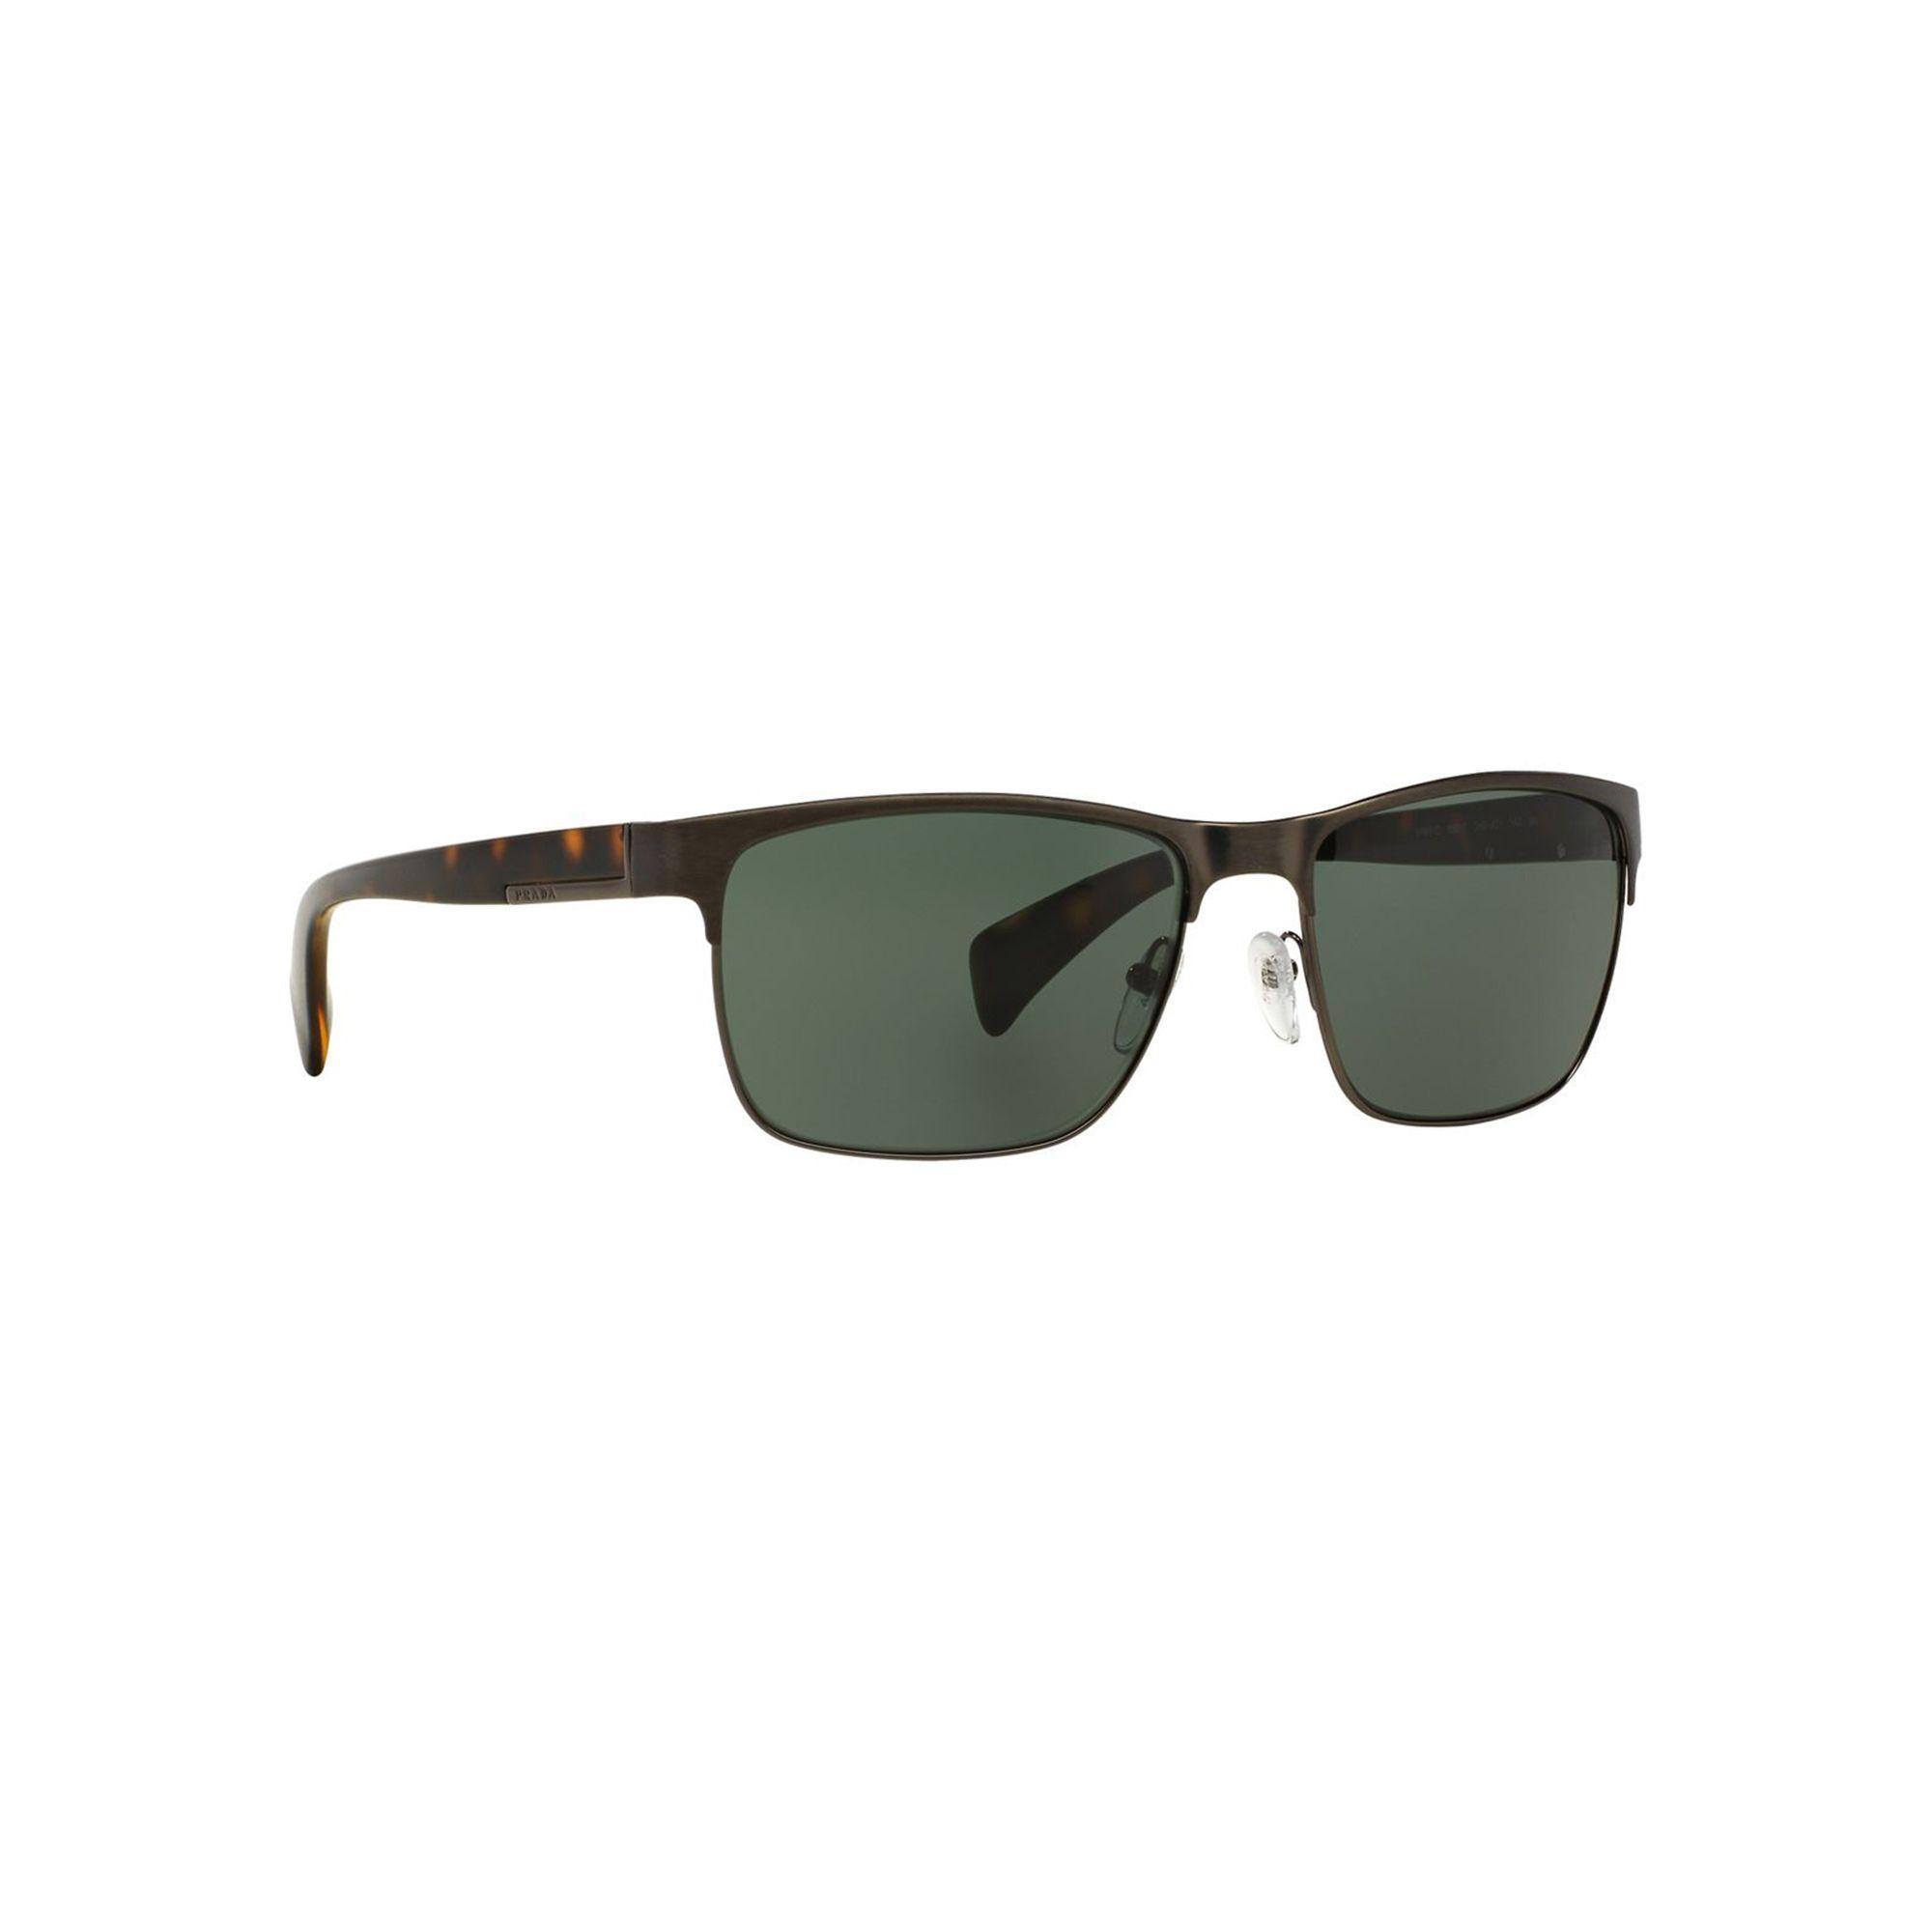 f9533fc541 ... cheap prada gunmetal rectangle pr 51os sunglasses in gray for men lyst  04927 ec06c